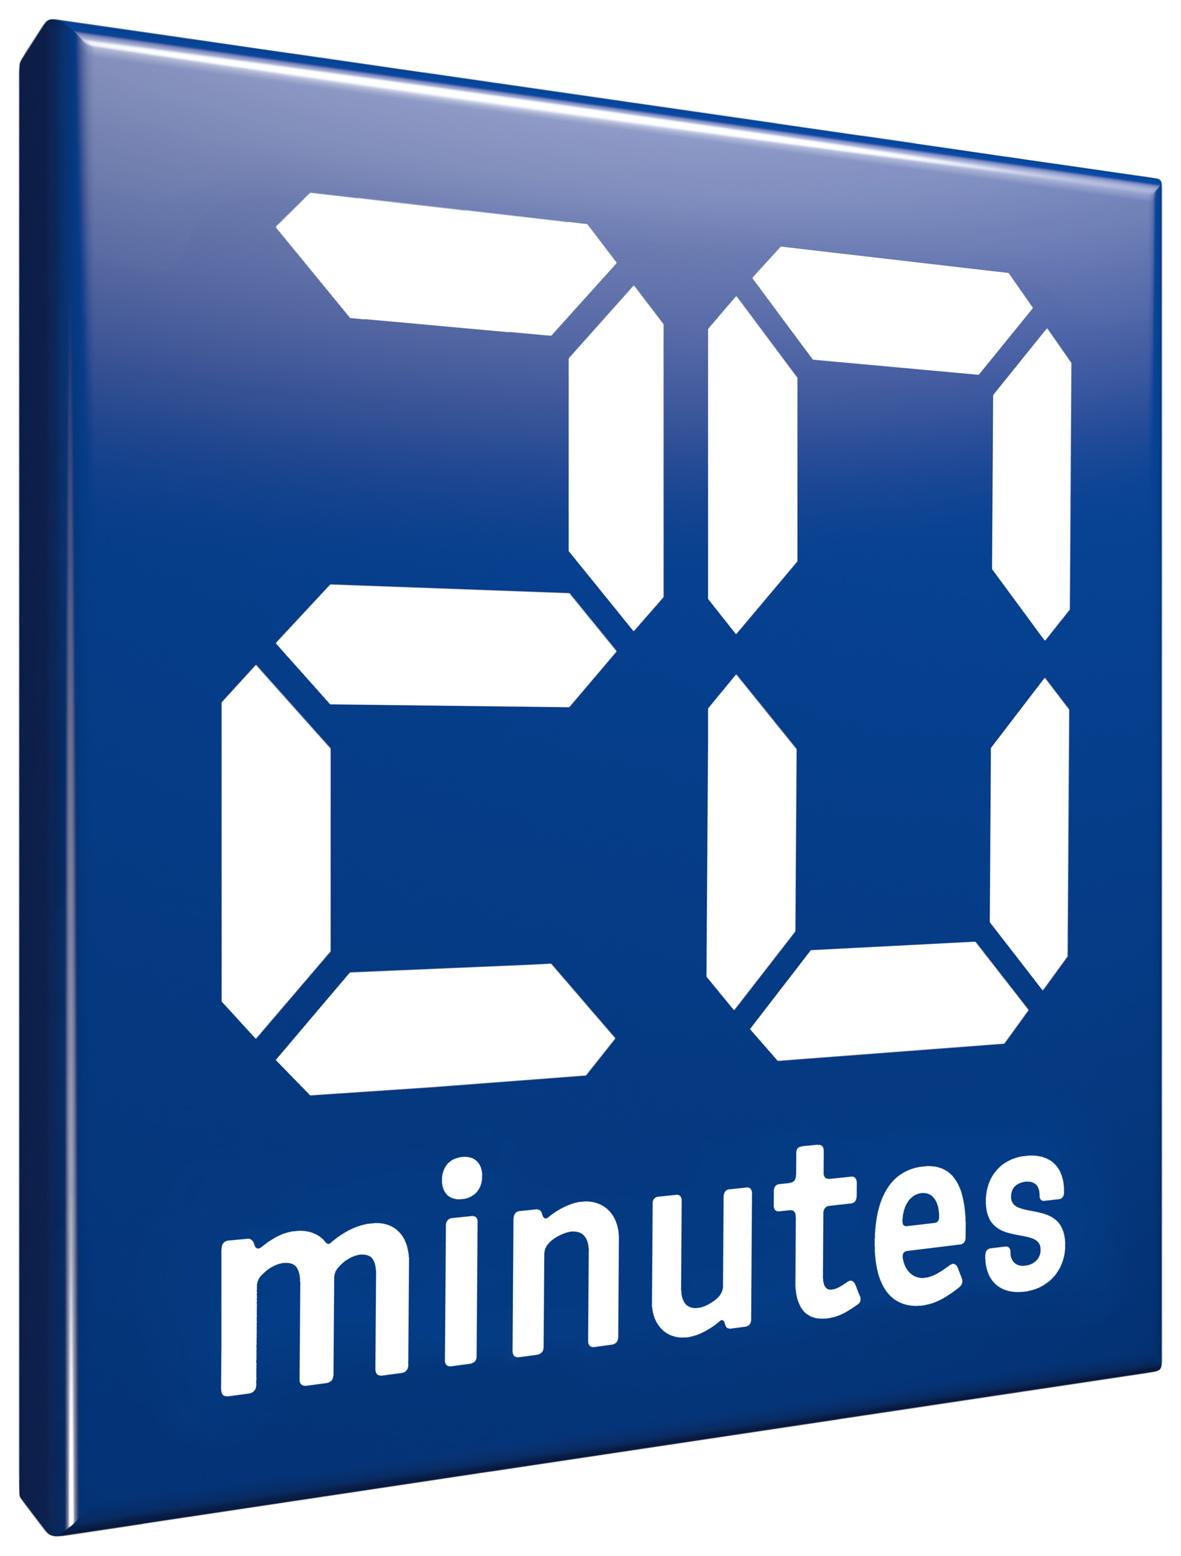 2018 Logo 20 minutes blue